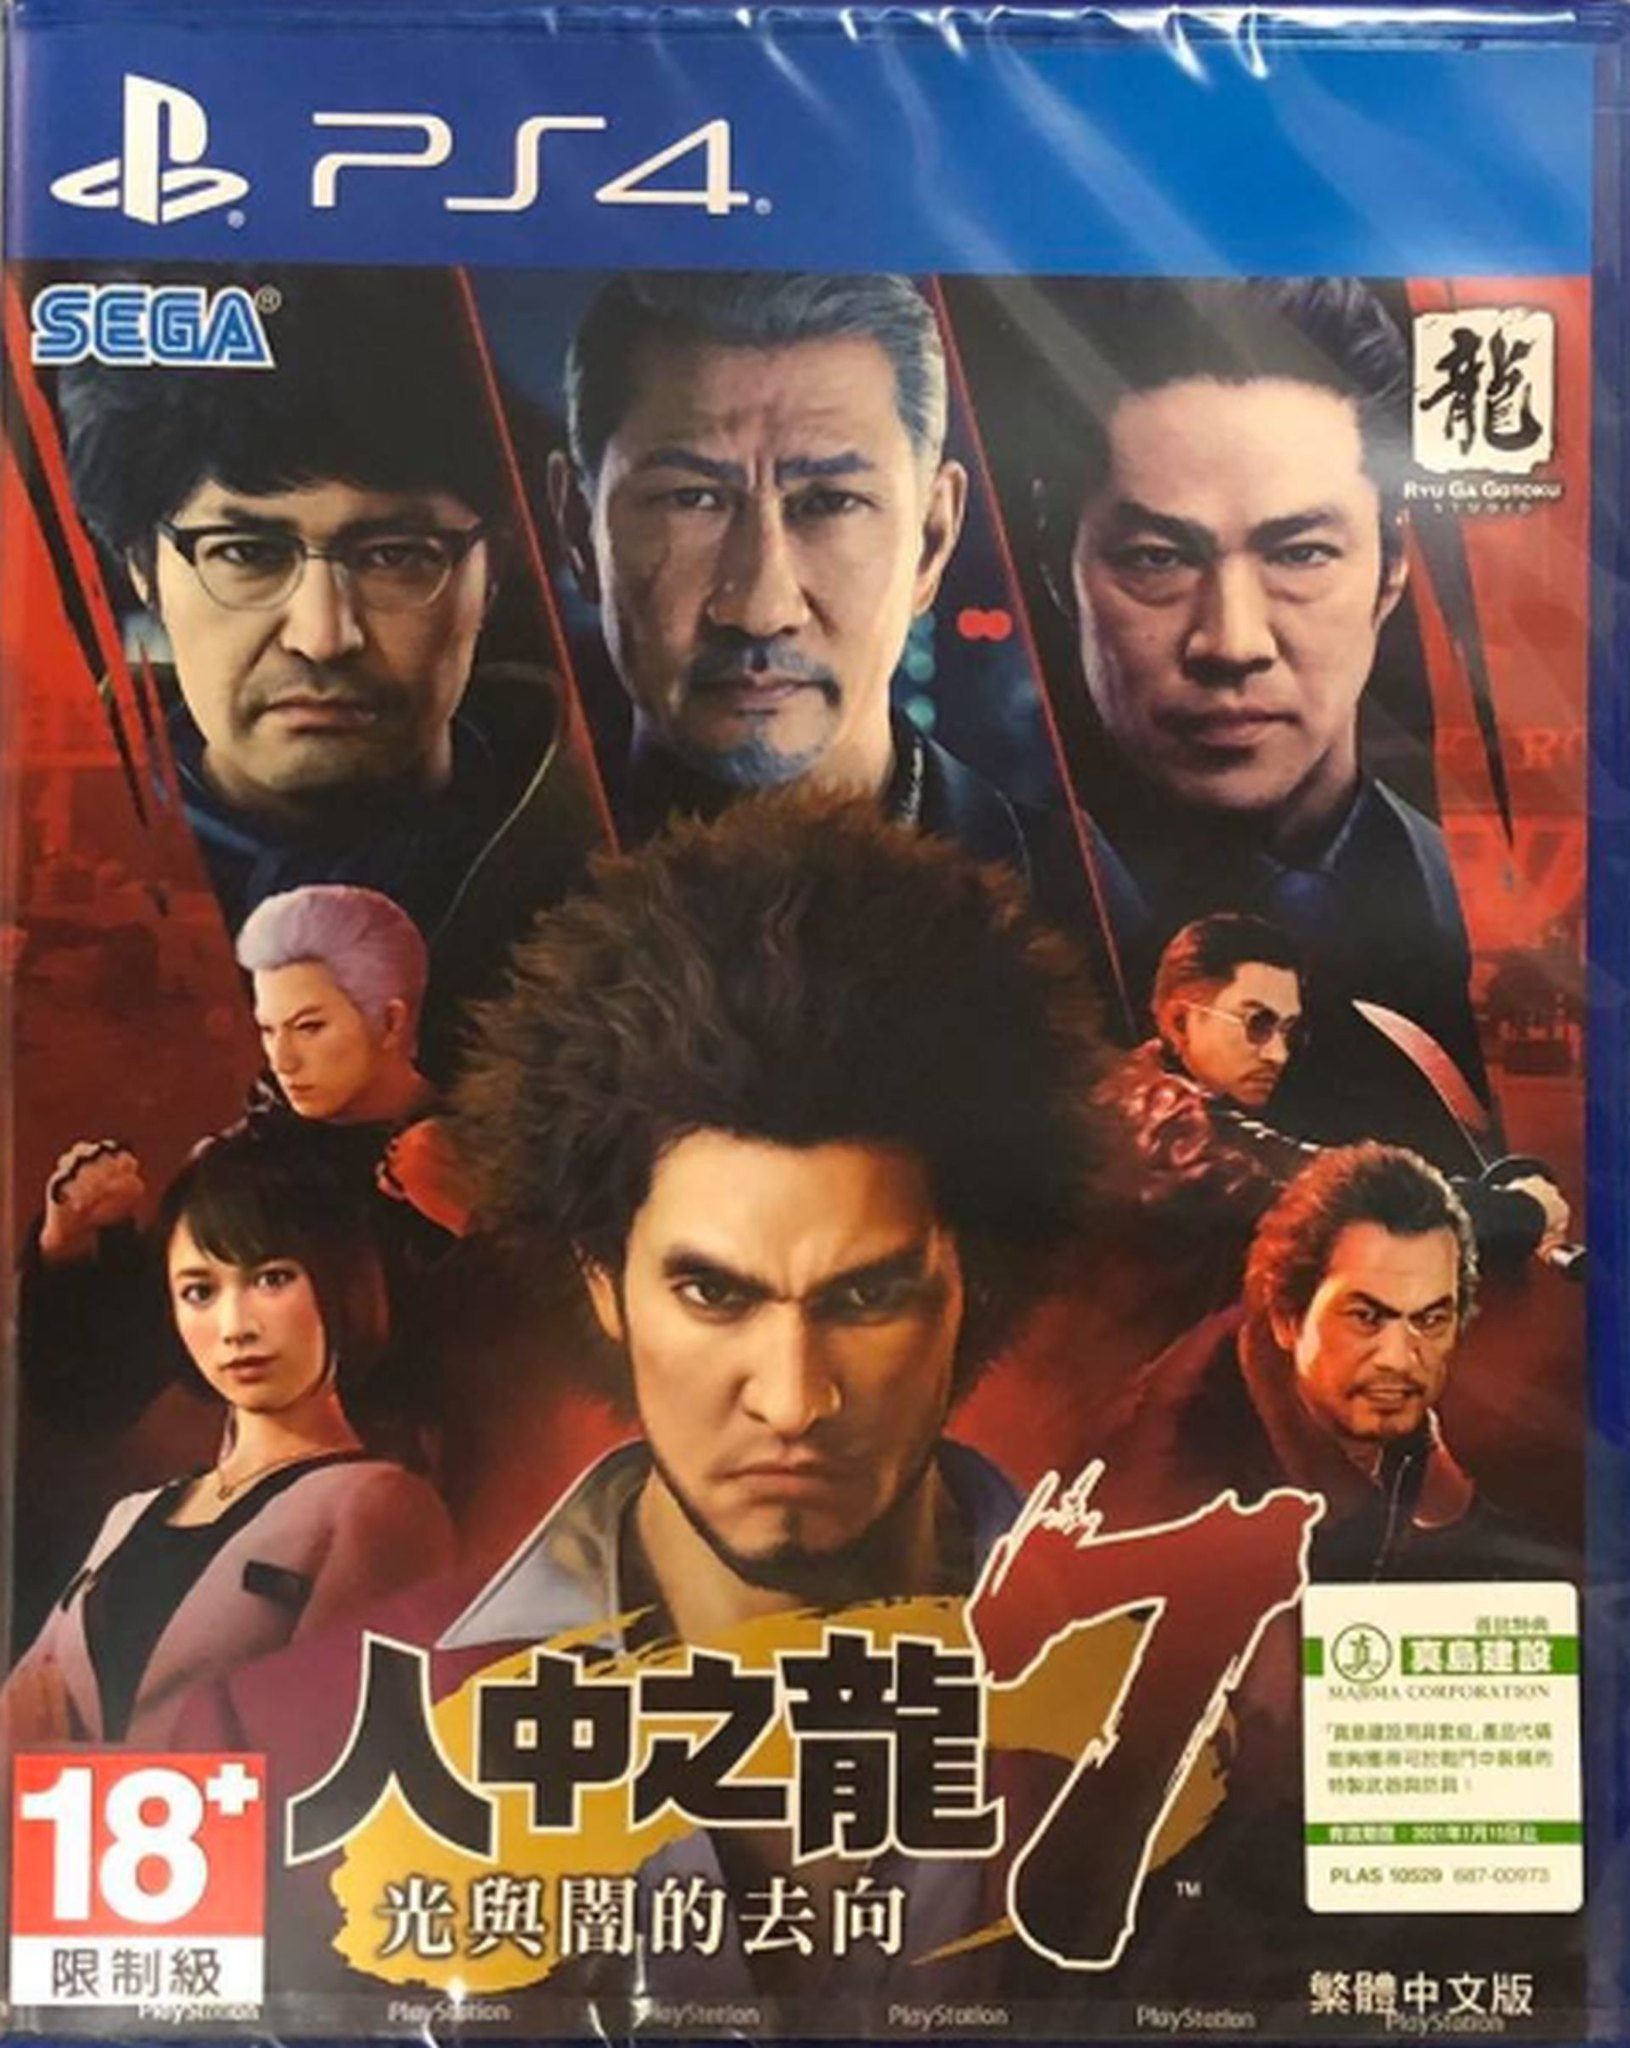 Ryu Ga Gotoku 7 Yakuza Like A Dragon Asia Chinese Subtitle W Dlc Ps4 Brand New Ebay